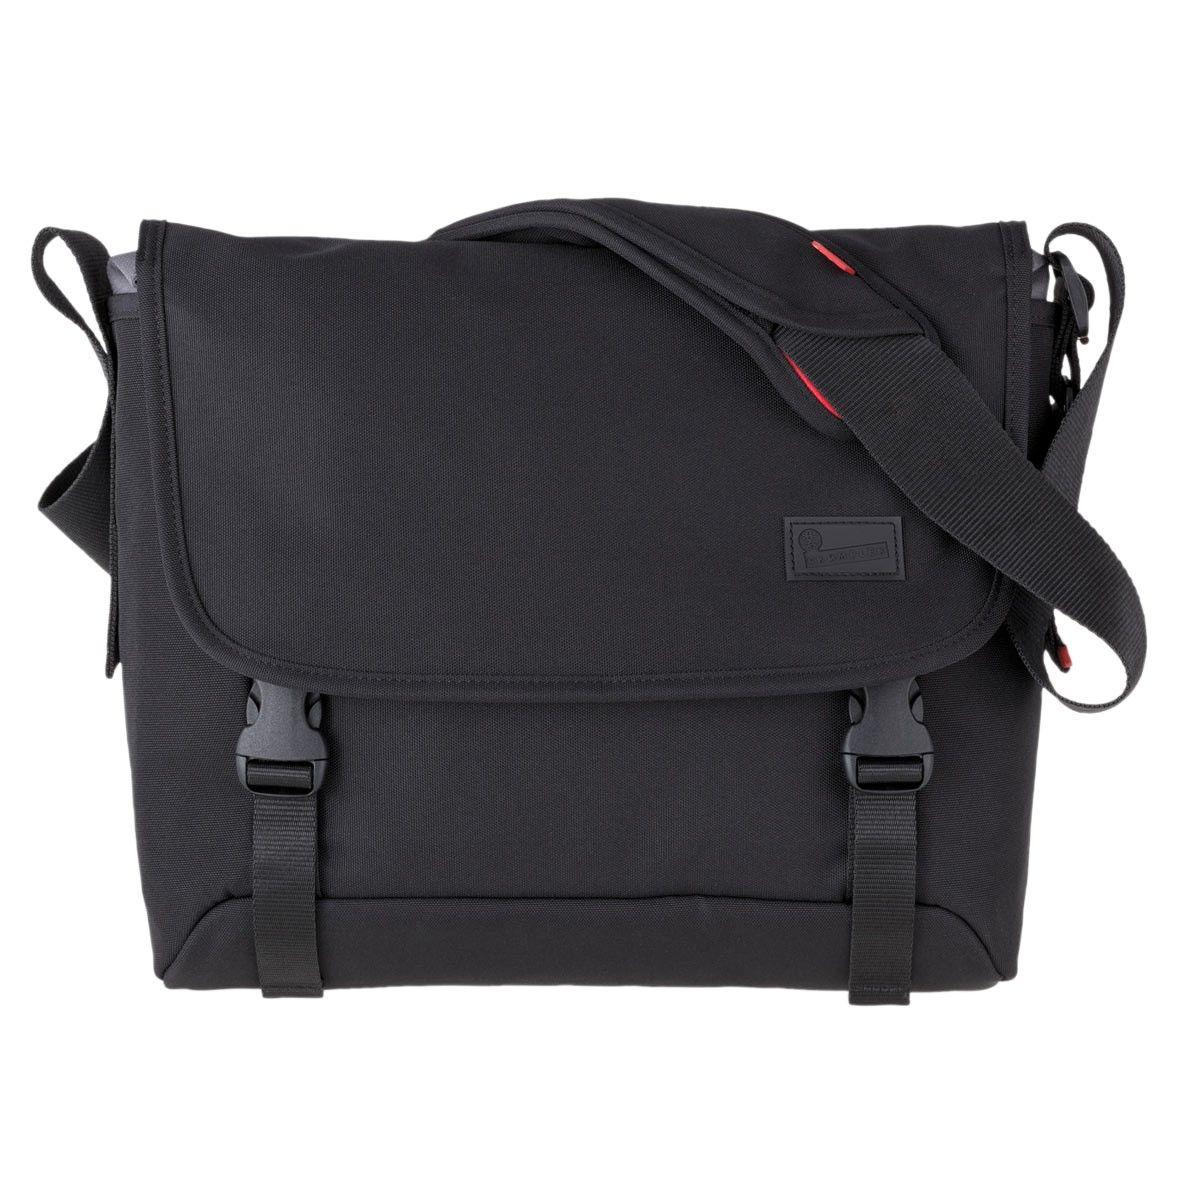 106f49b0b18a CRUMPLER Skivvy (M) Laptop Shoulder Bag   Accessories   Laptop ...